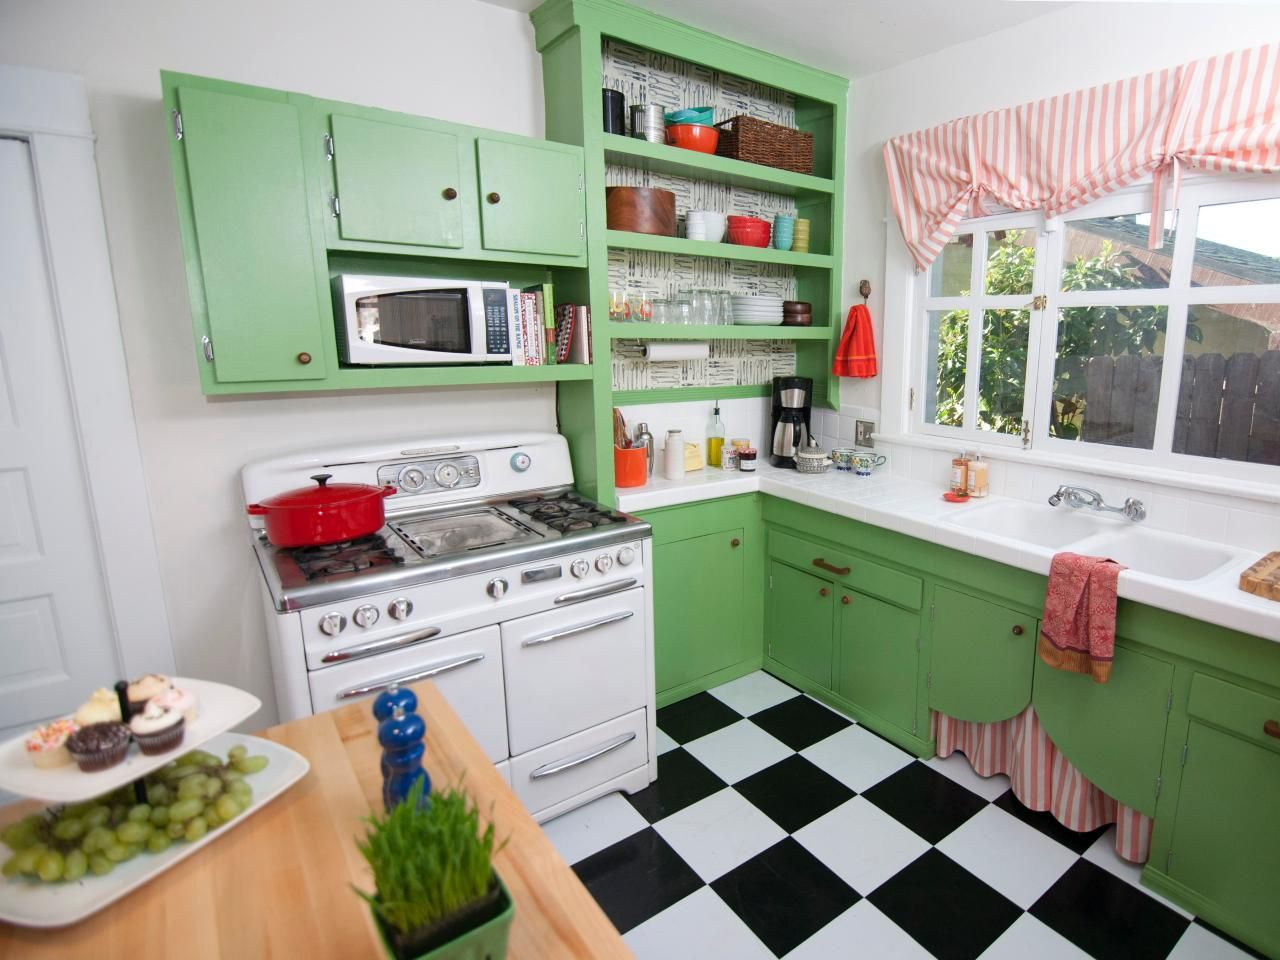 Photos   Design On A Dime   HGTV - Love this kitchen!   Our 1941 ...